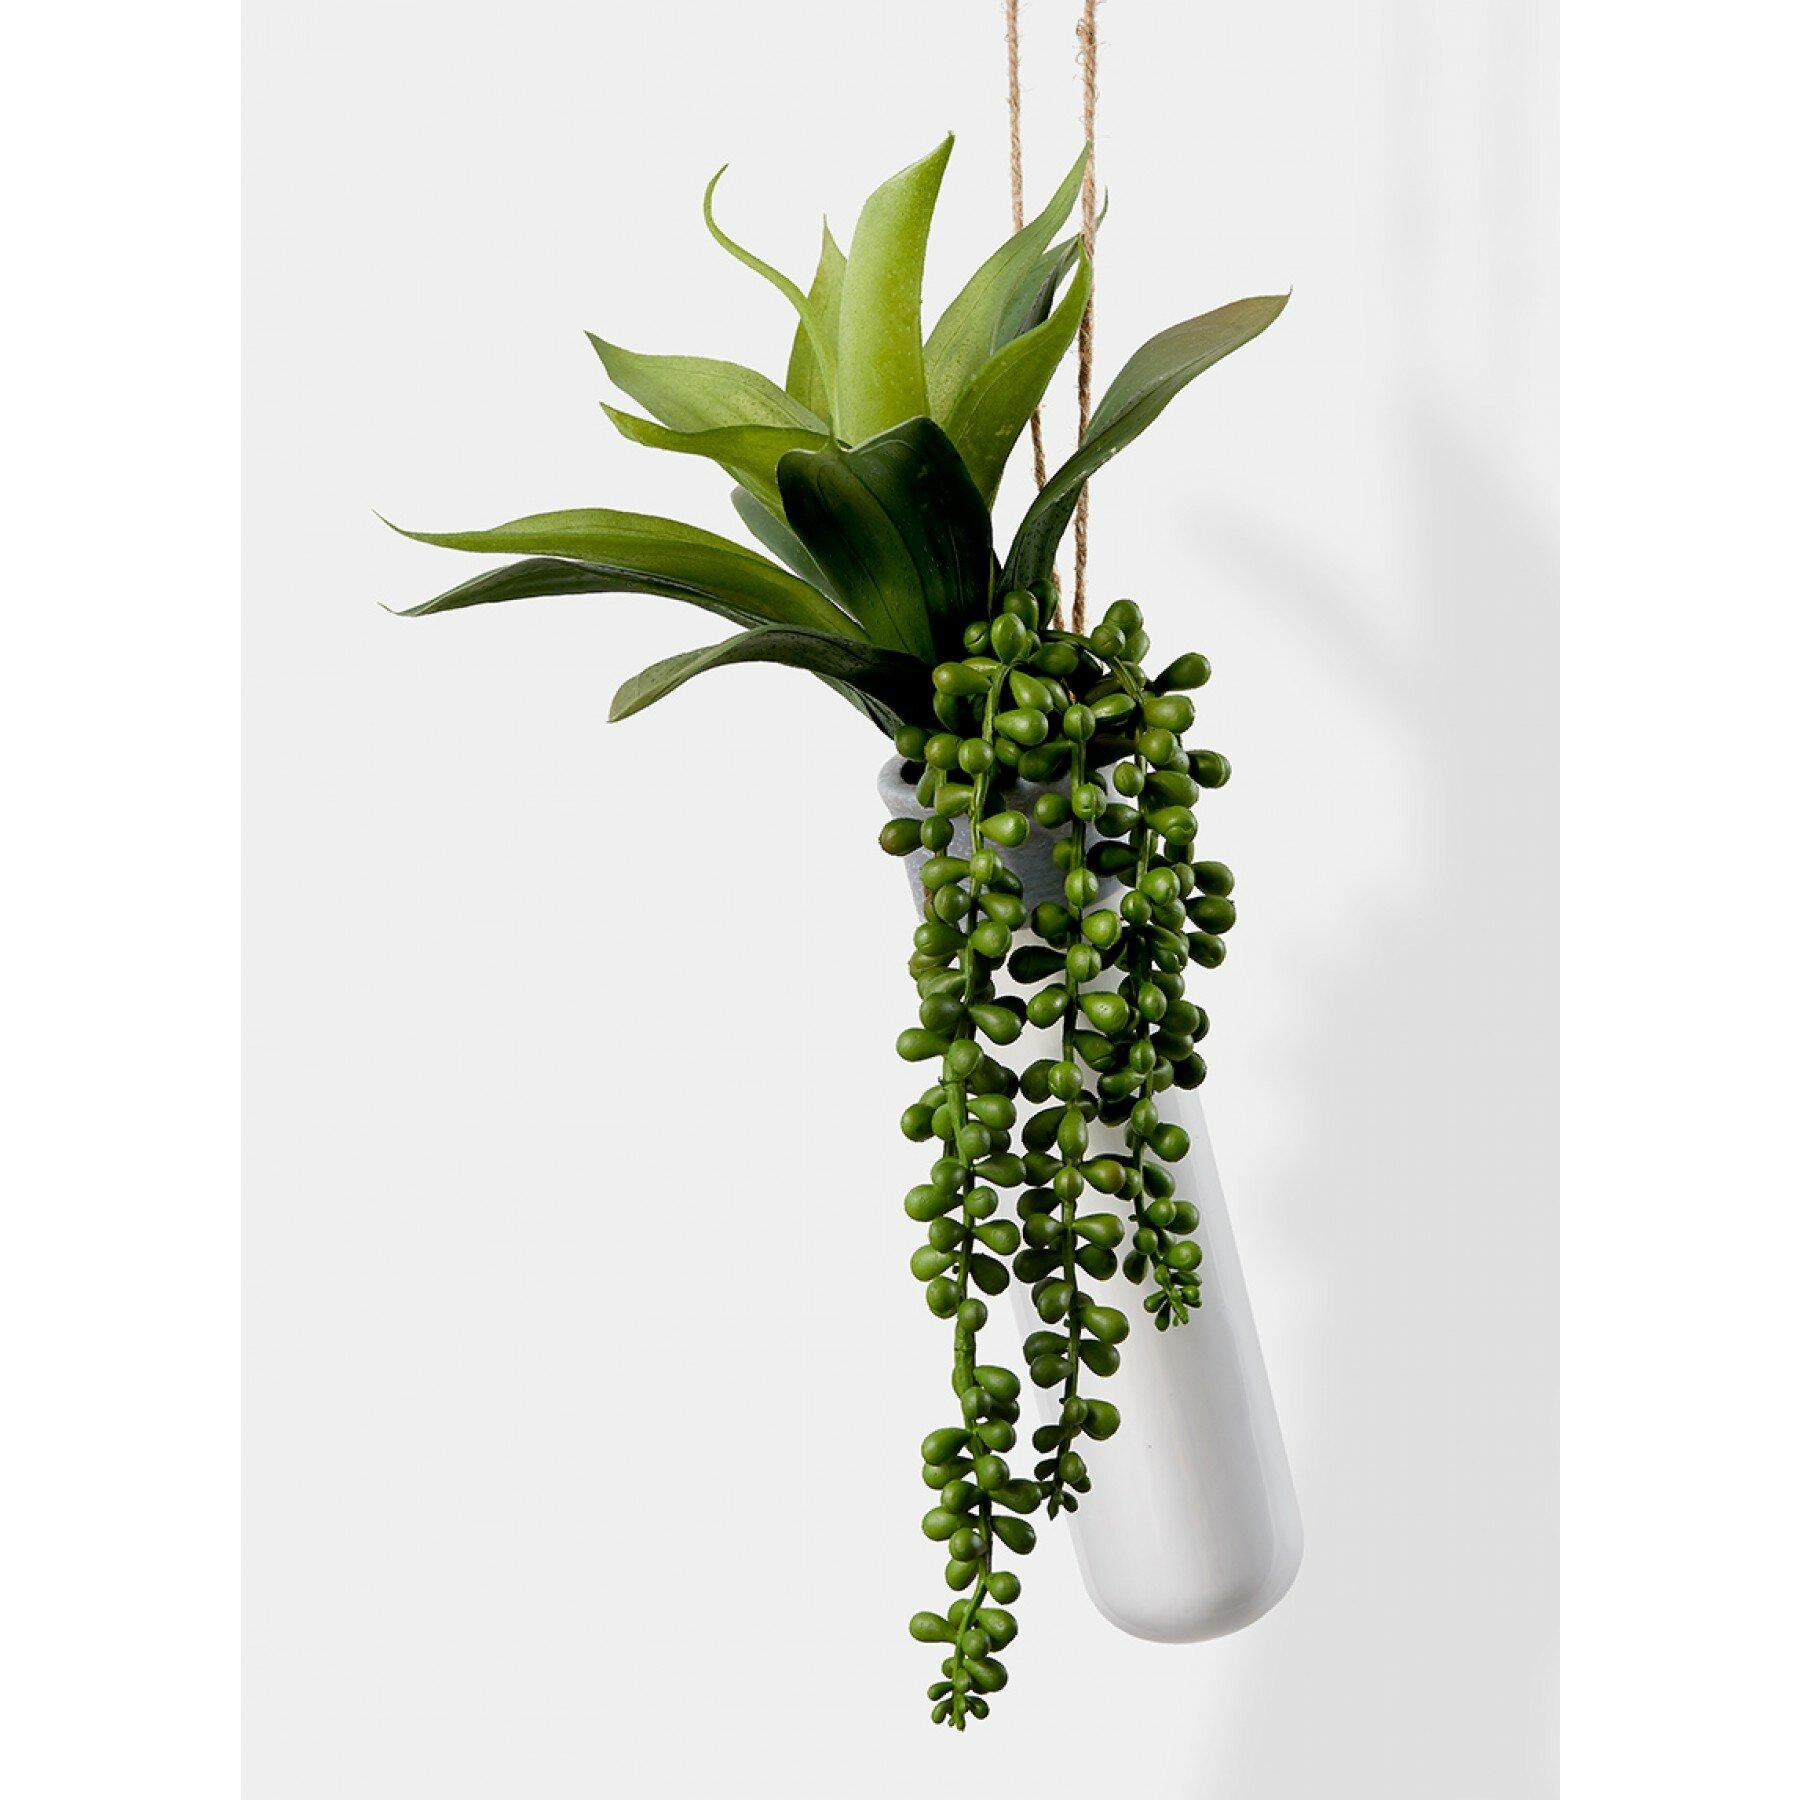 Bungalow Rose Hanging Succulent Plant In Ceramic Planter Reviews Wayfair